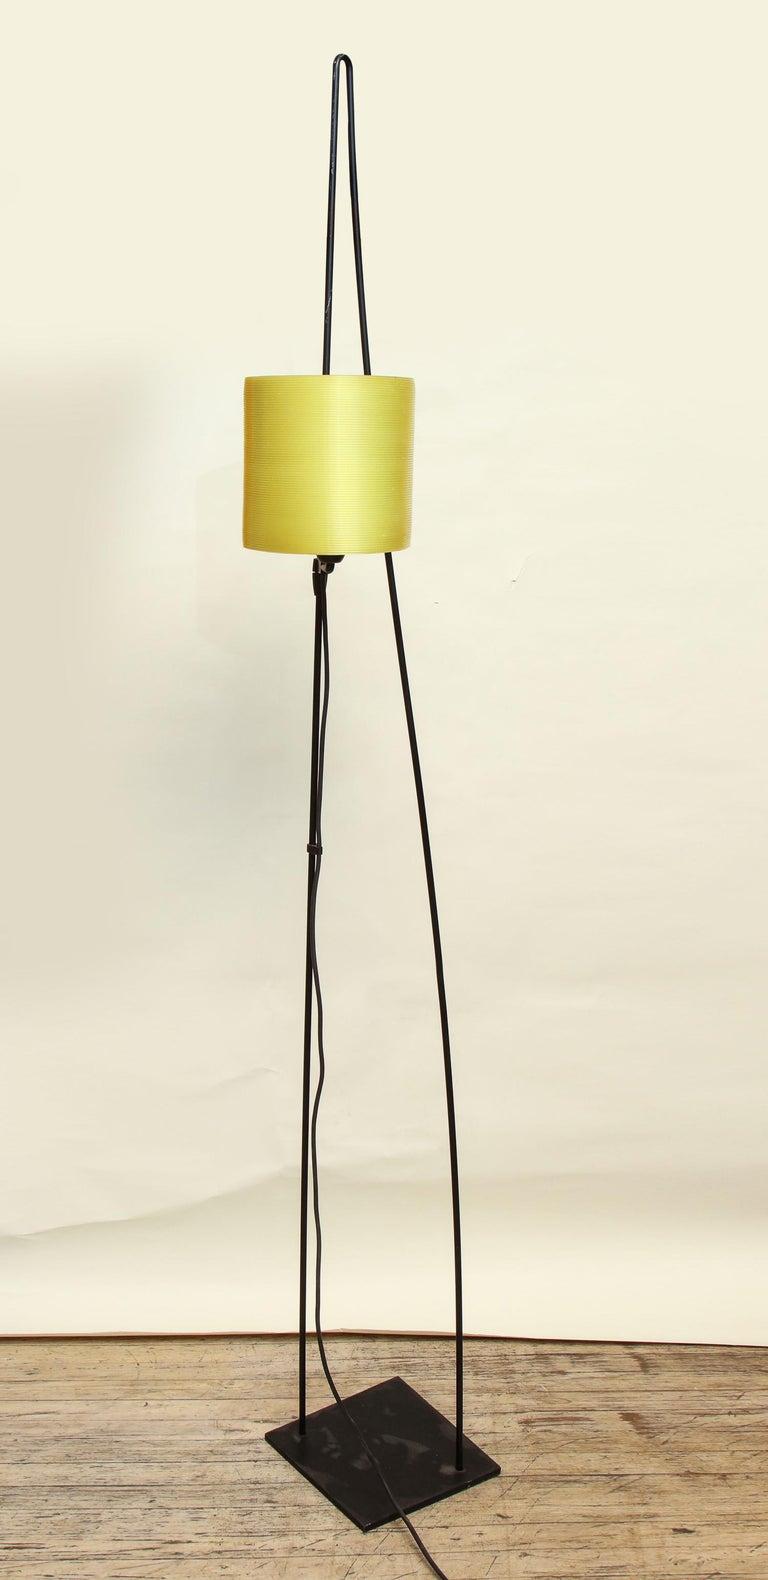 Iron Italiana Luce Floor Lamp Mid-Century Modern Ion and Plexiglass, Italy, 1970 For Sale